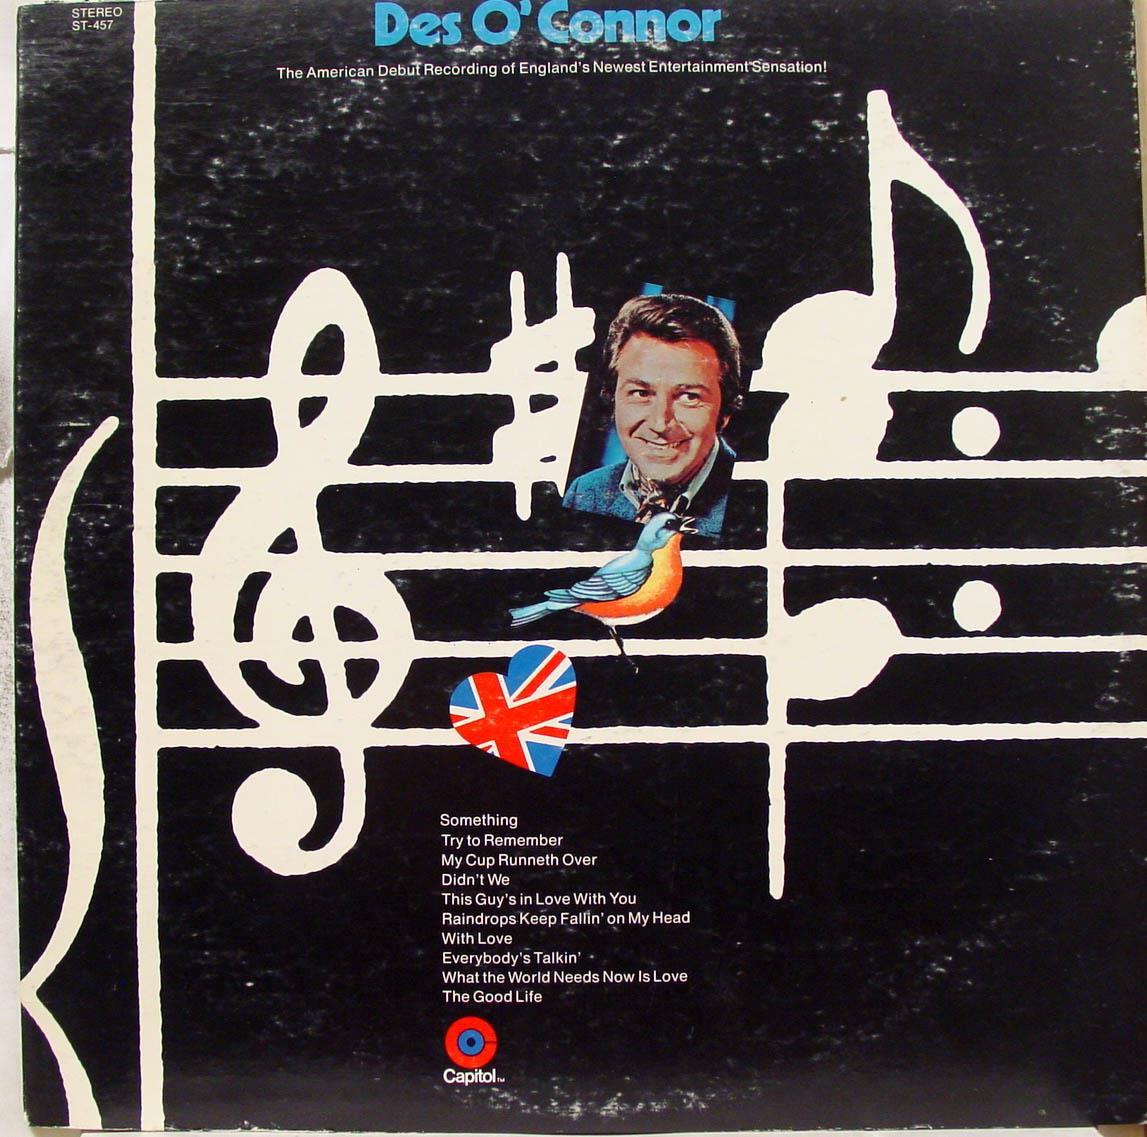 DES O CONNOR - Des O Connor S/t Debut Lp Vg+ St 457 Vinyl Record (s/t Debut)